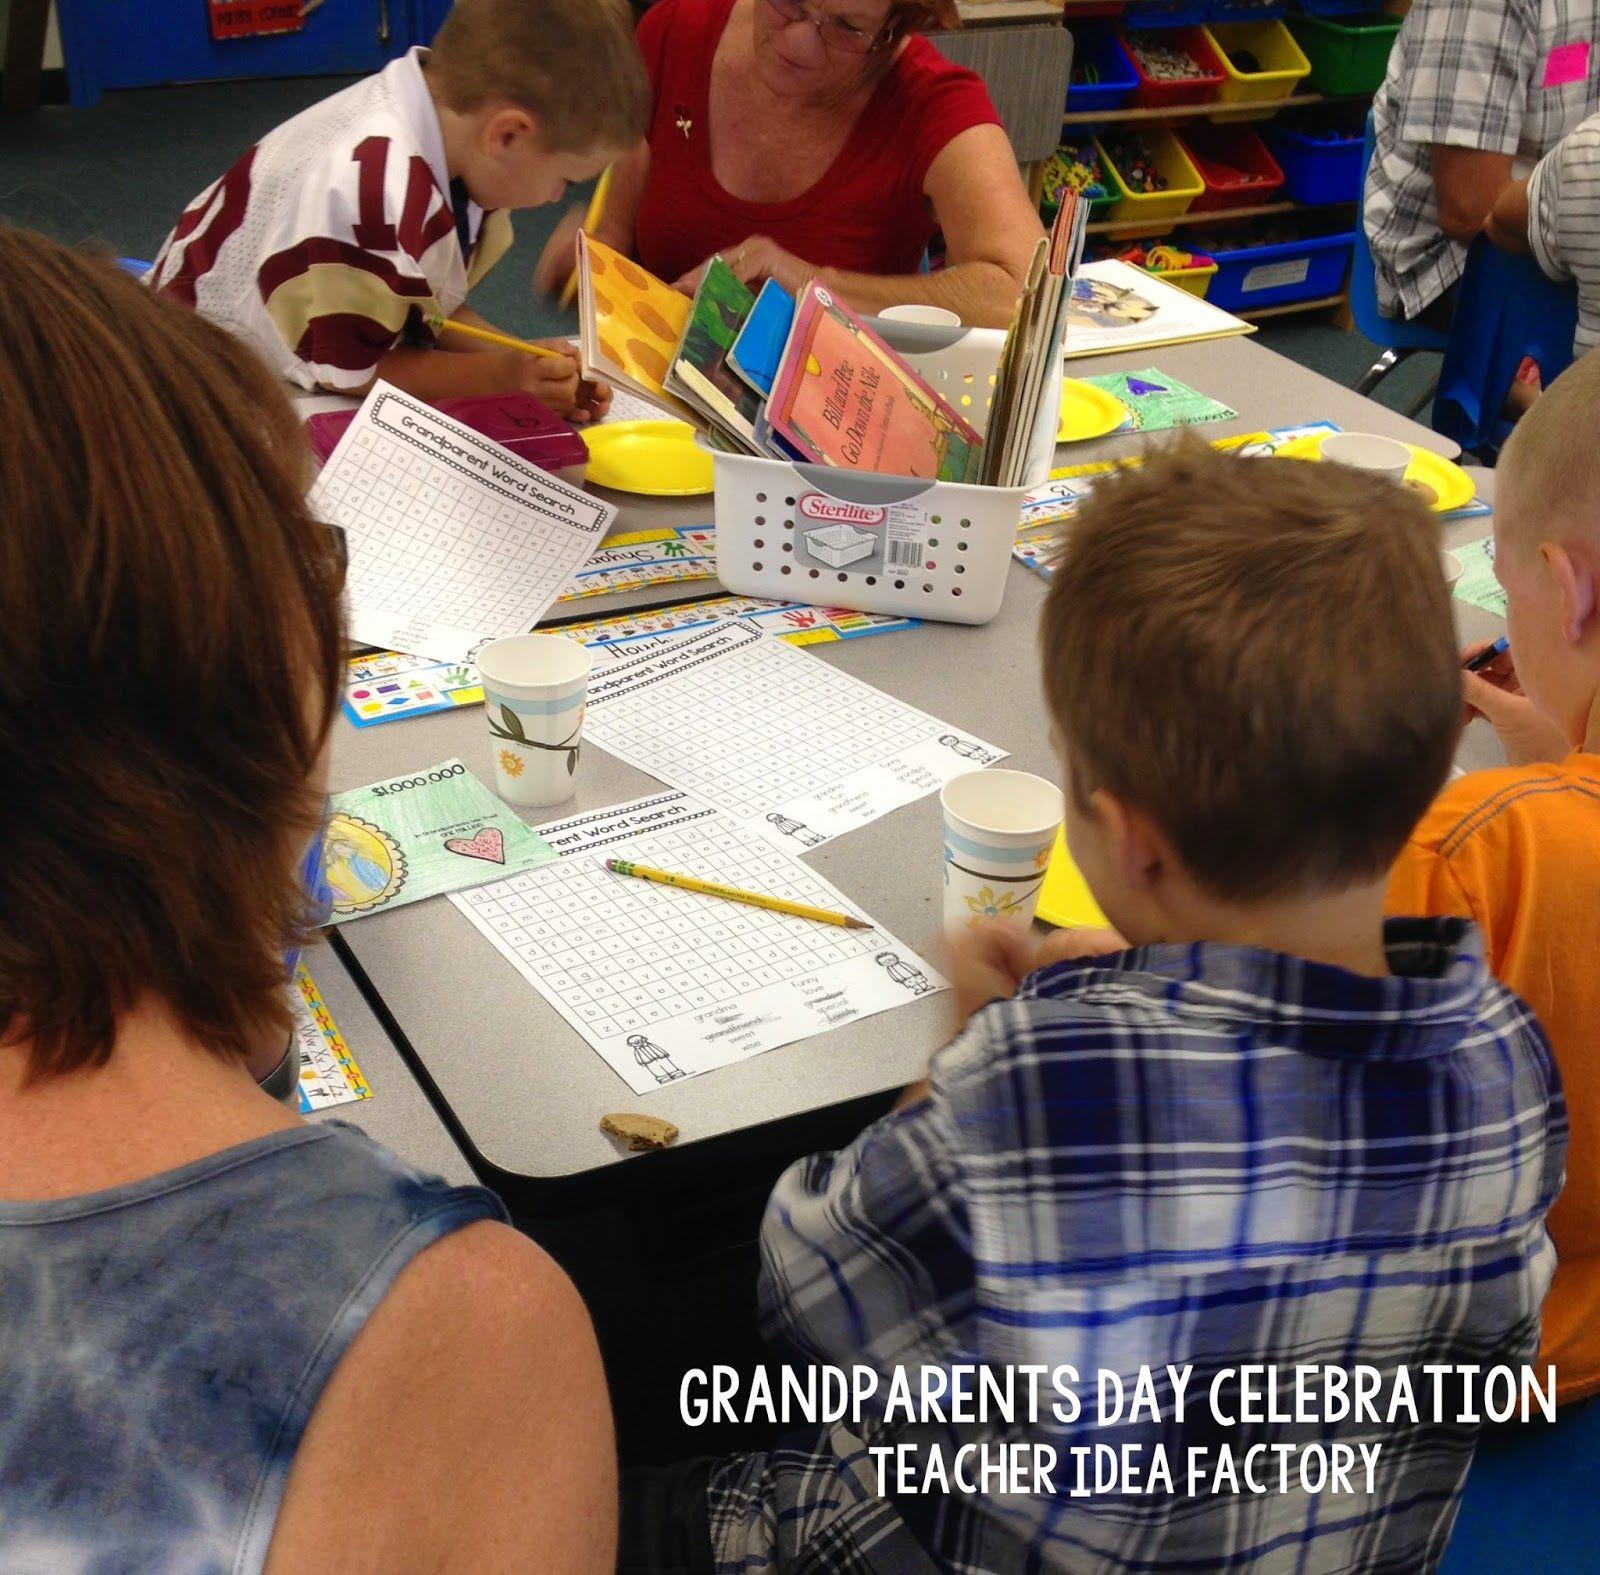 Teacher Idea Factory Grandparents Day Is September 7th